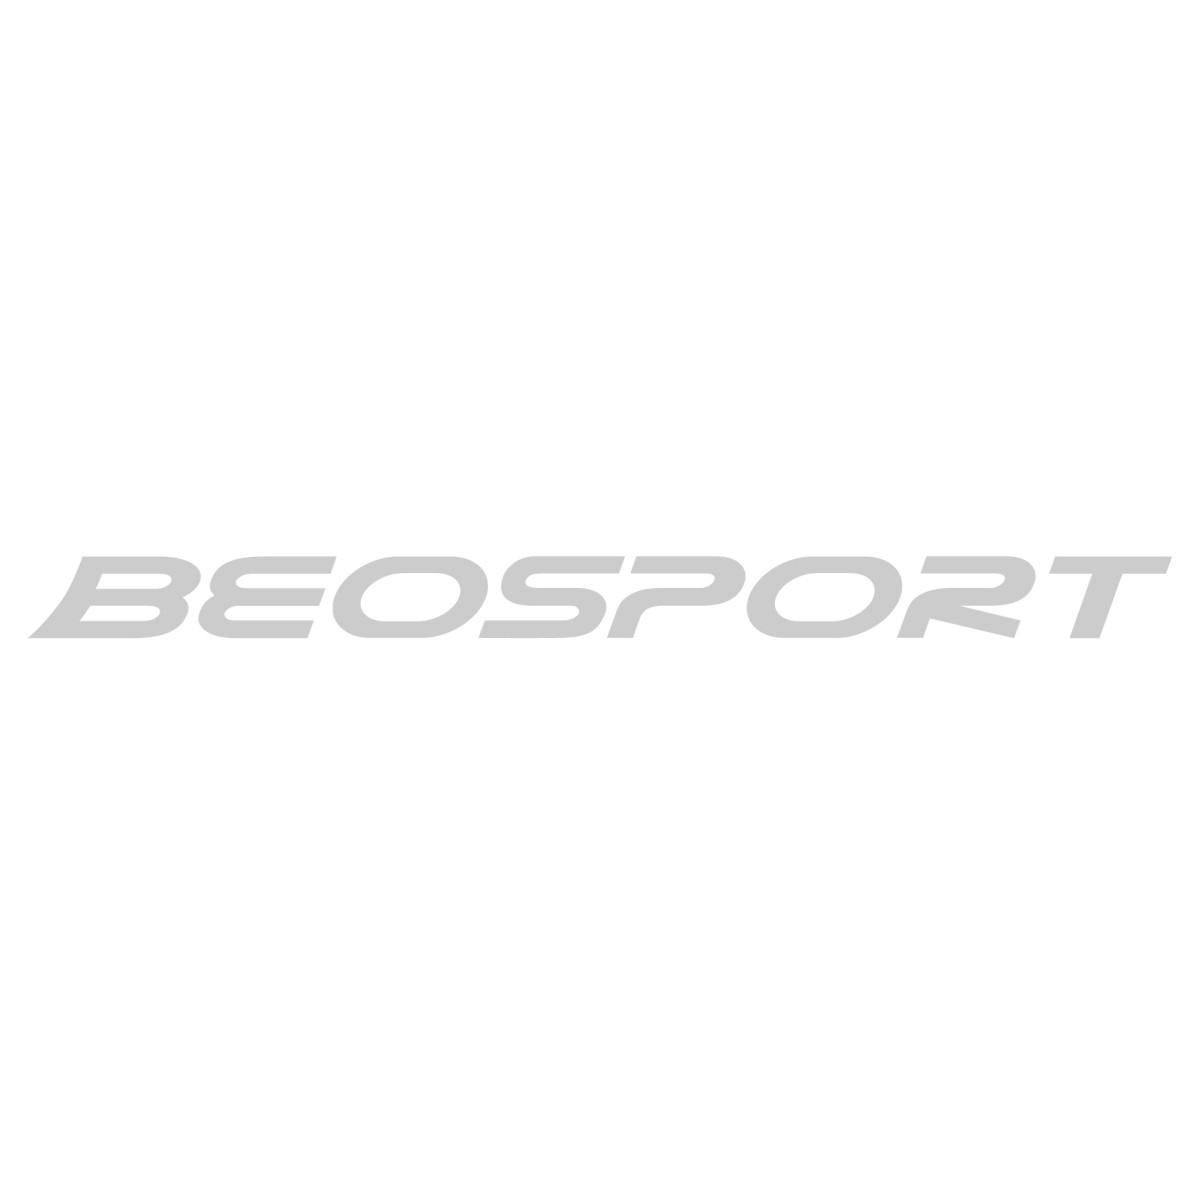 Wilson Alu Power 1.3mm / 200m žica za tenis